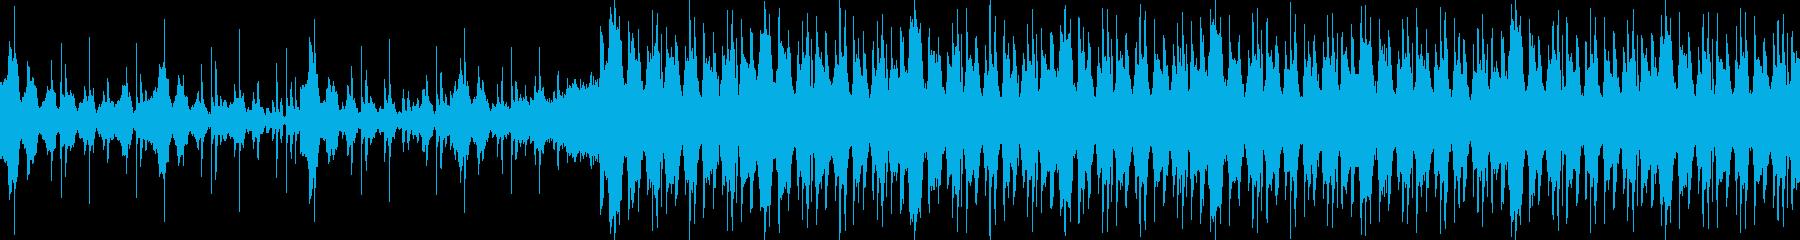 VP、CM、暖かい爽やかな透明感ループの再生済みの波形